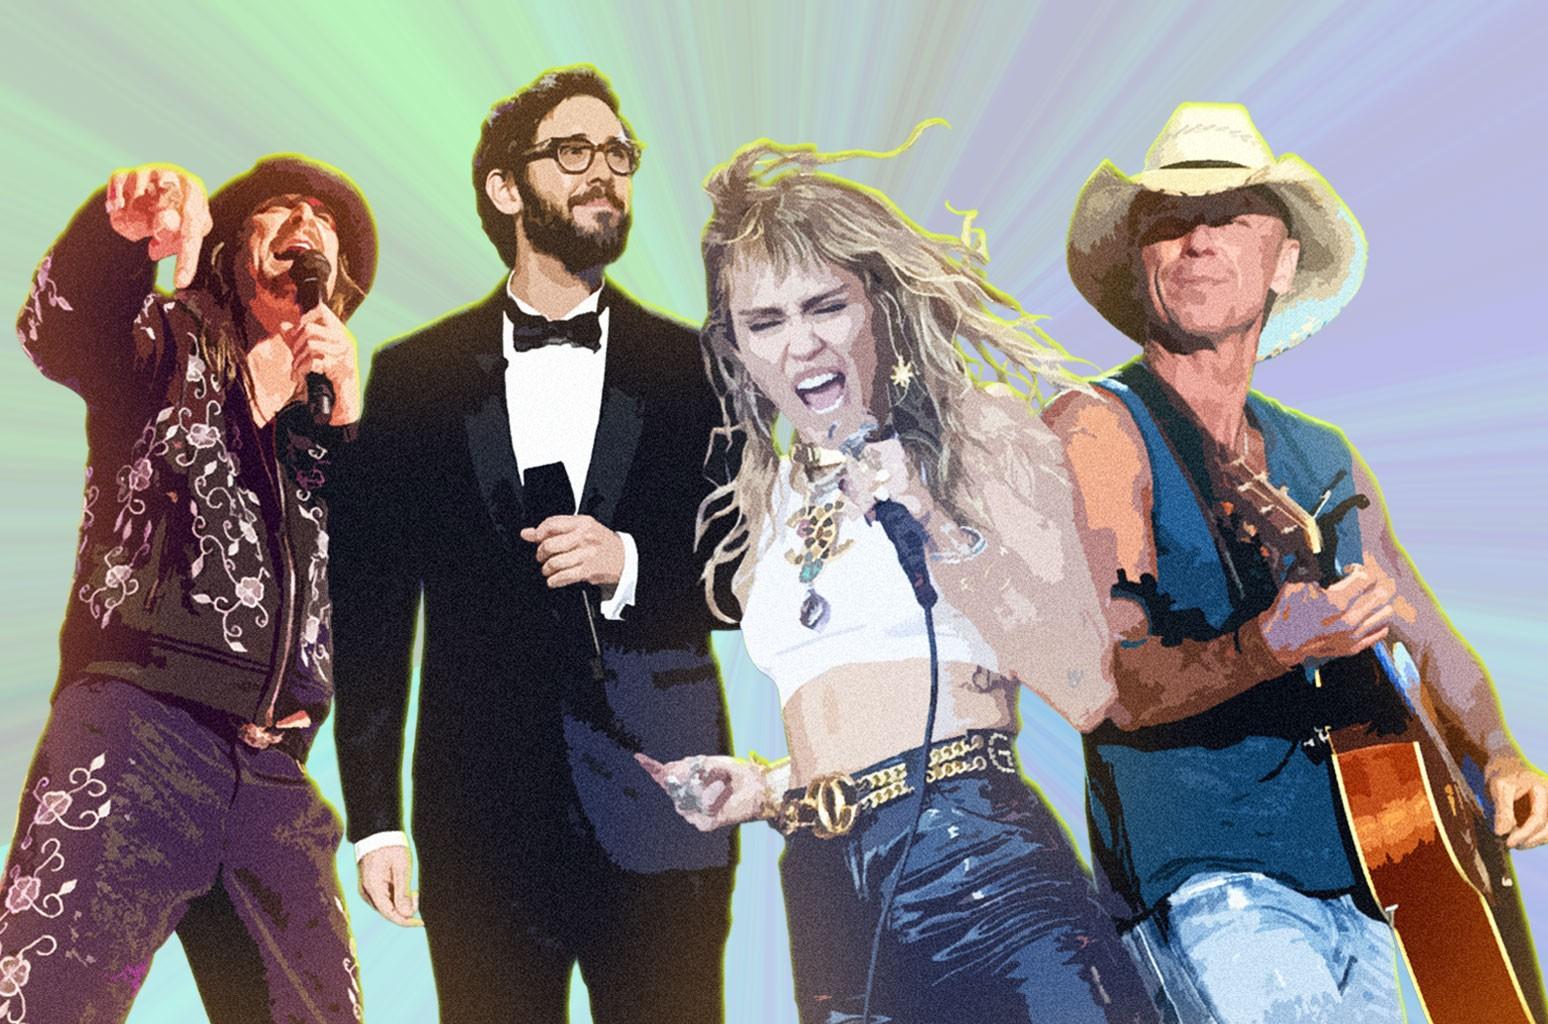 Kid Rock, Josh Groban, Miley Cyrus, Kenny Chesney